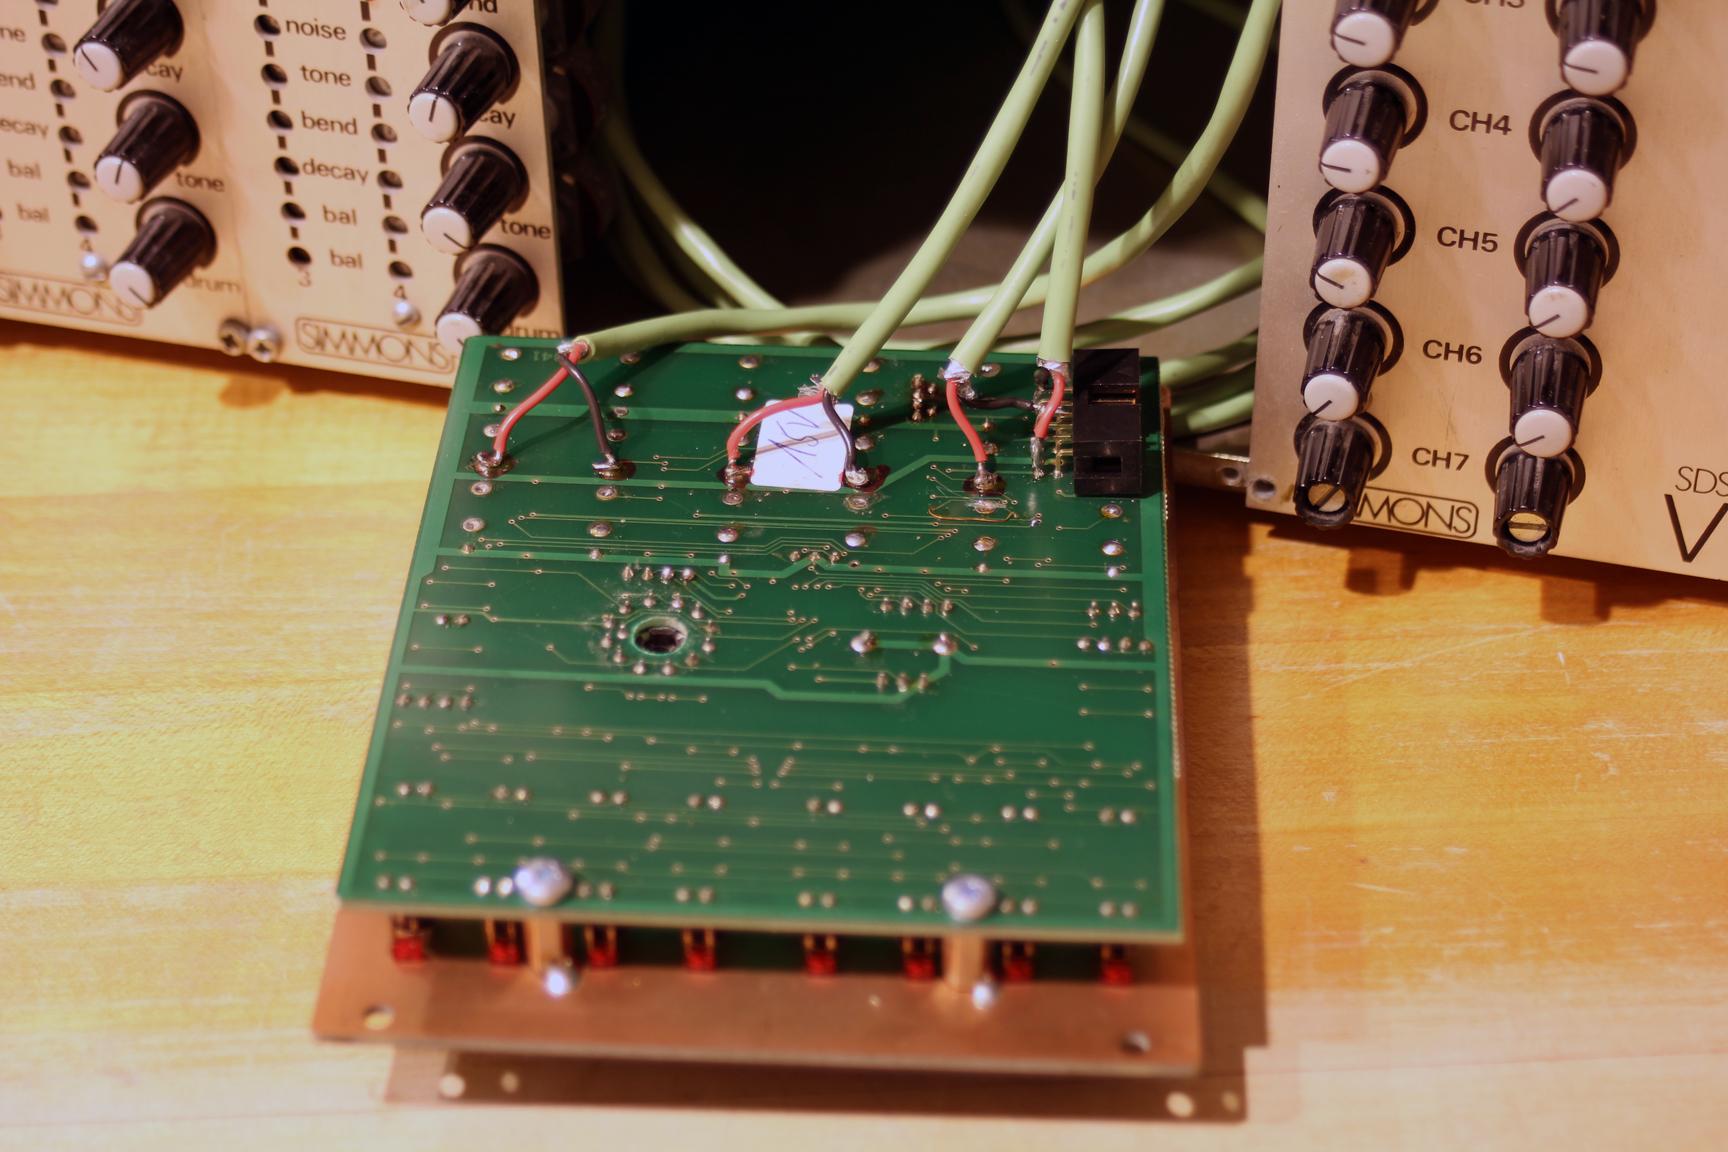 10-sdsv-mfb-module-connections-2.jpg